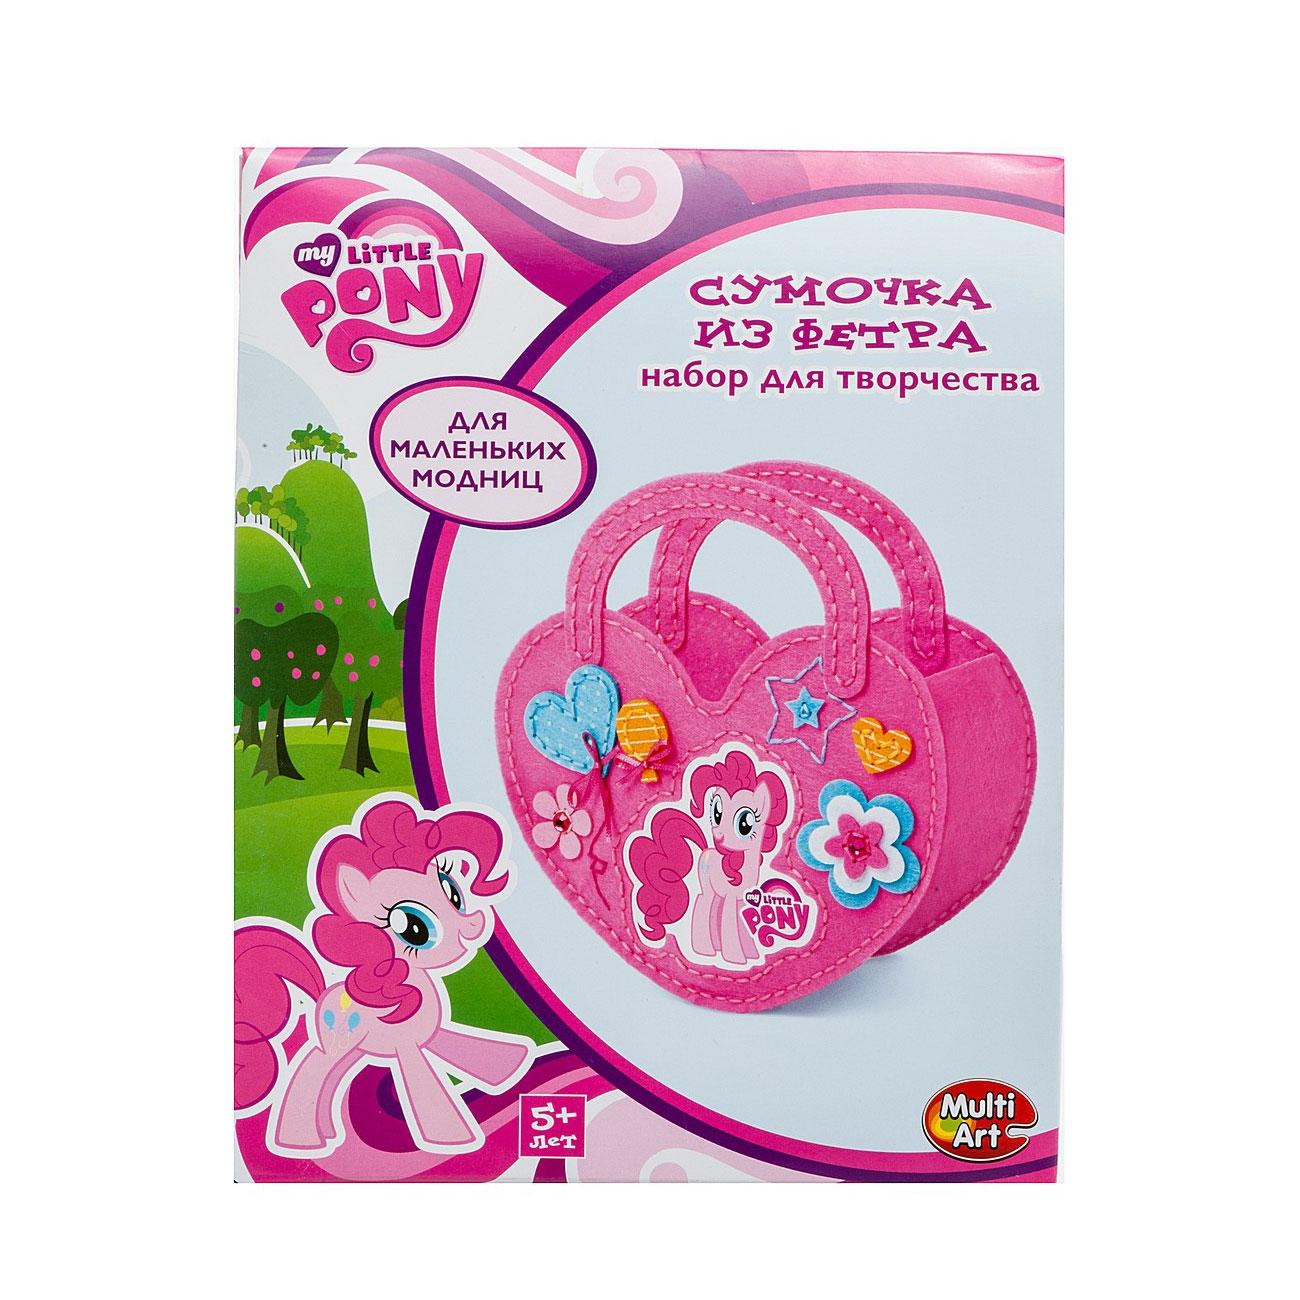 Набор для творчества Multiart My little pony Сделай сумочку из фетра<br>